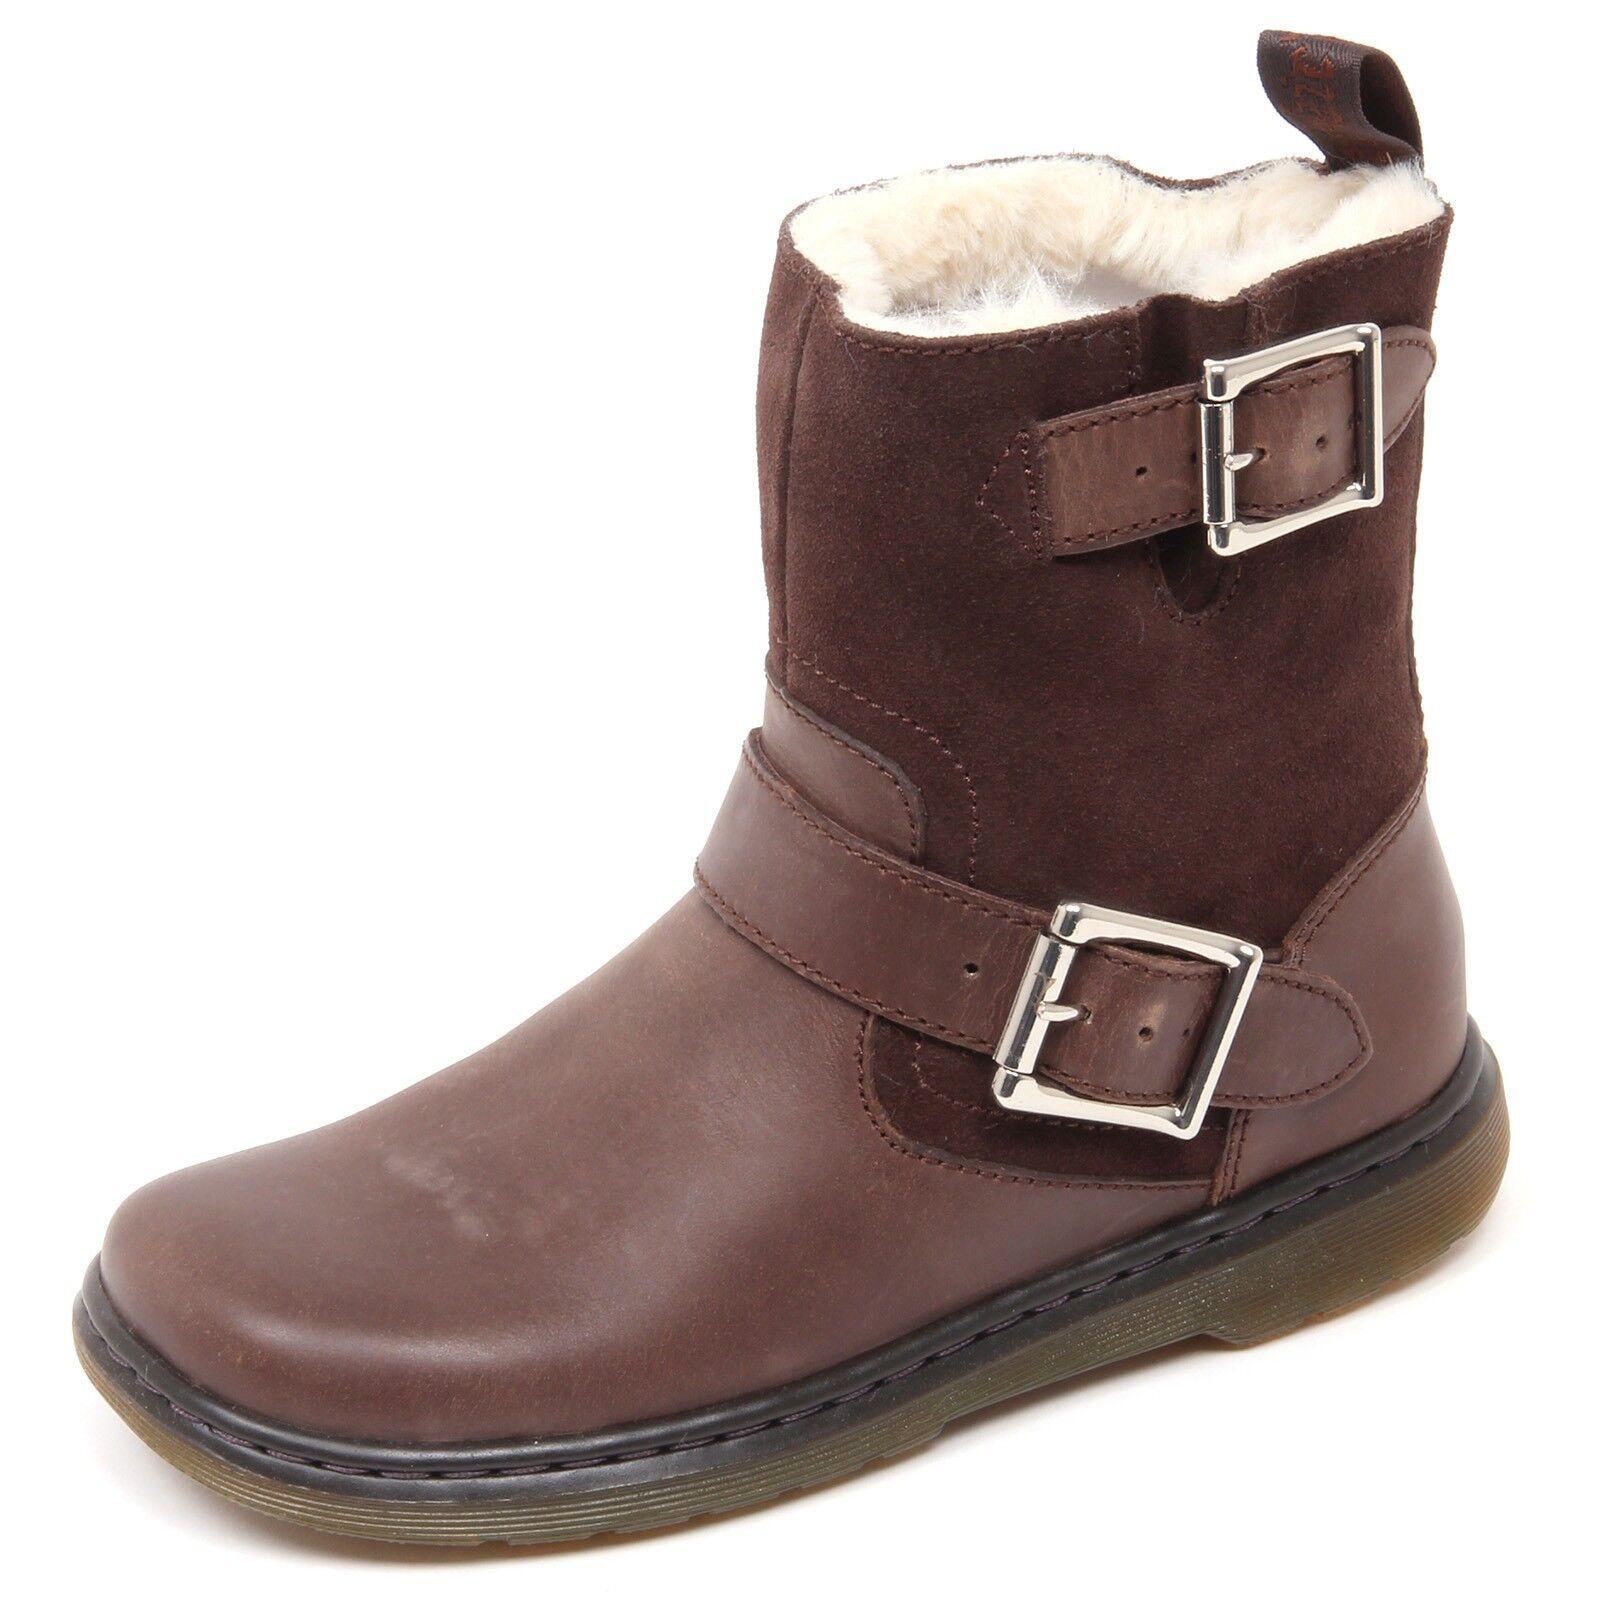 Grandes zapatos con descuento D1654 stivaletto donna DR MARTENS GAYLE FL marrone vintage boot shoe woman